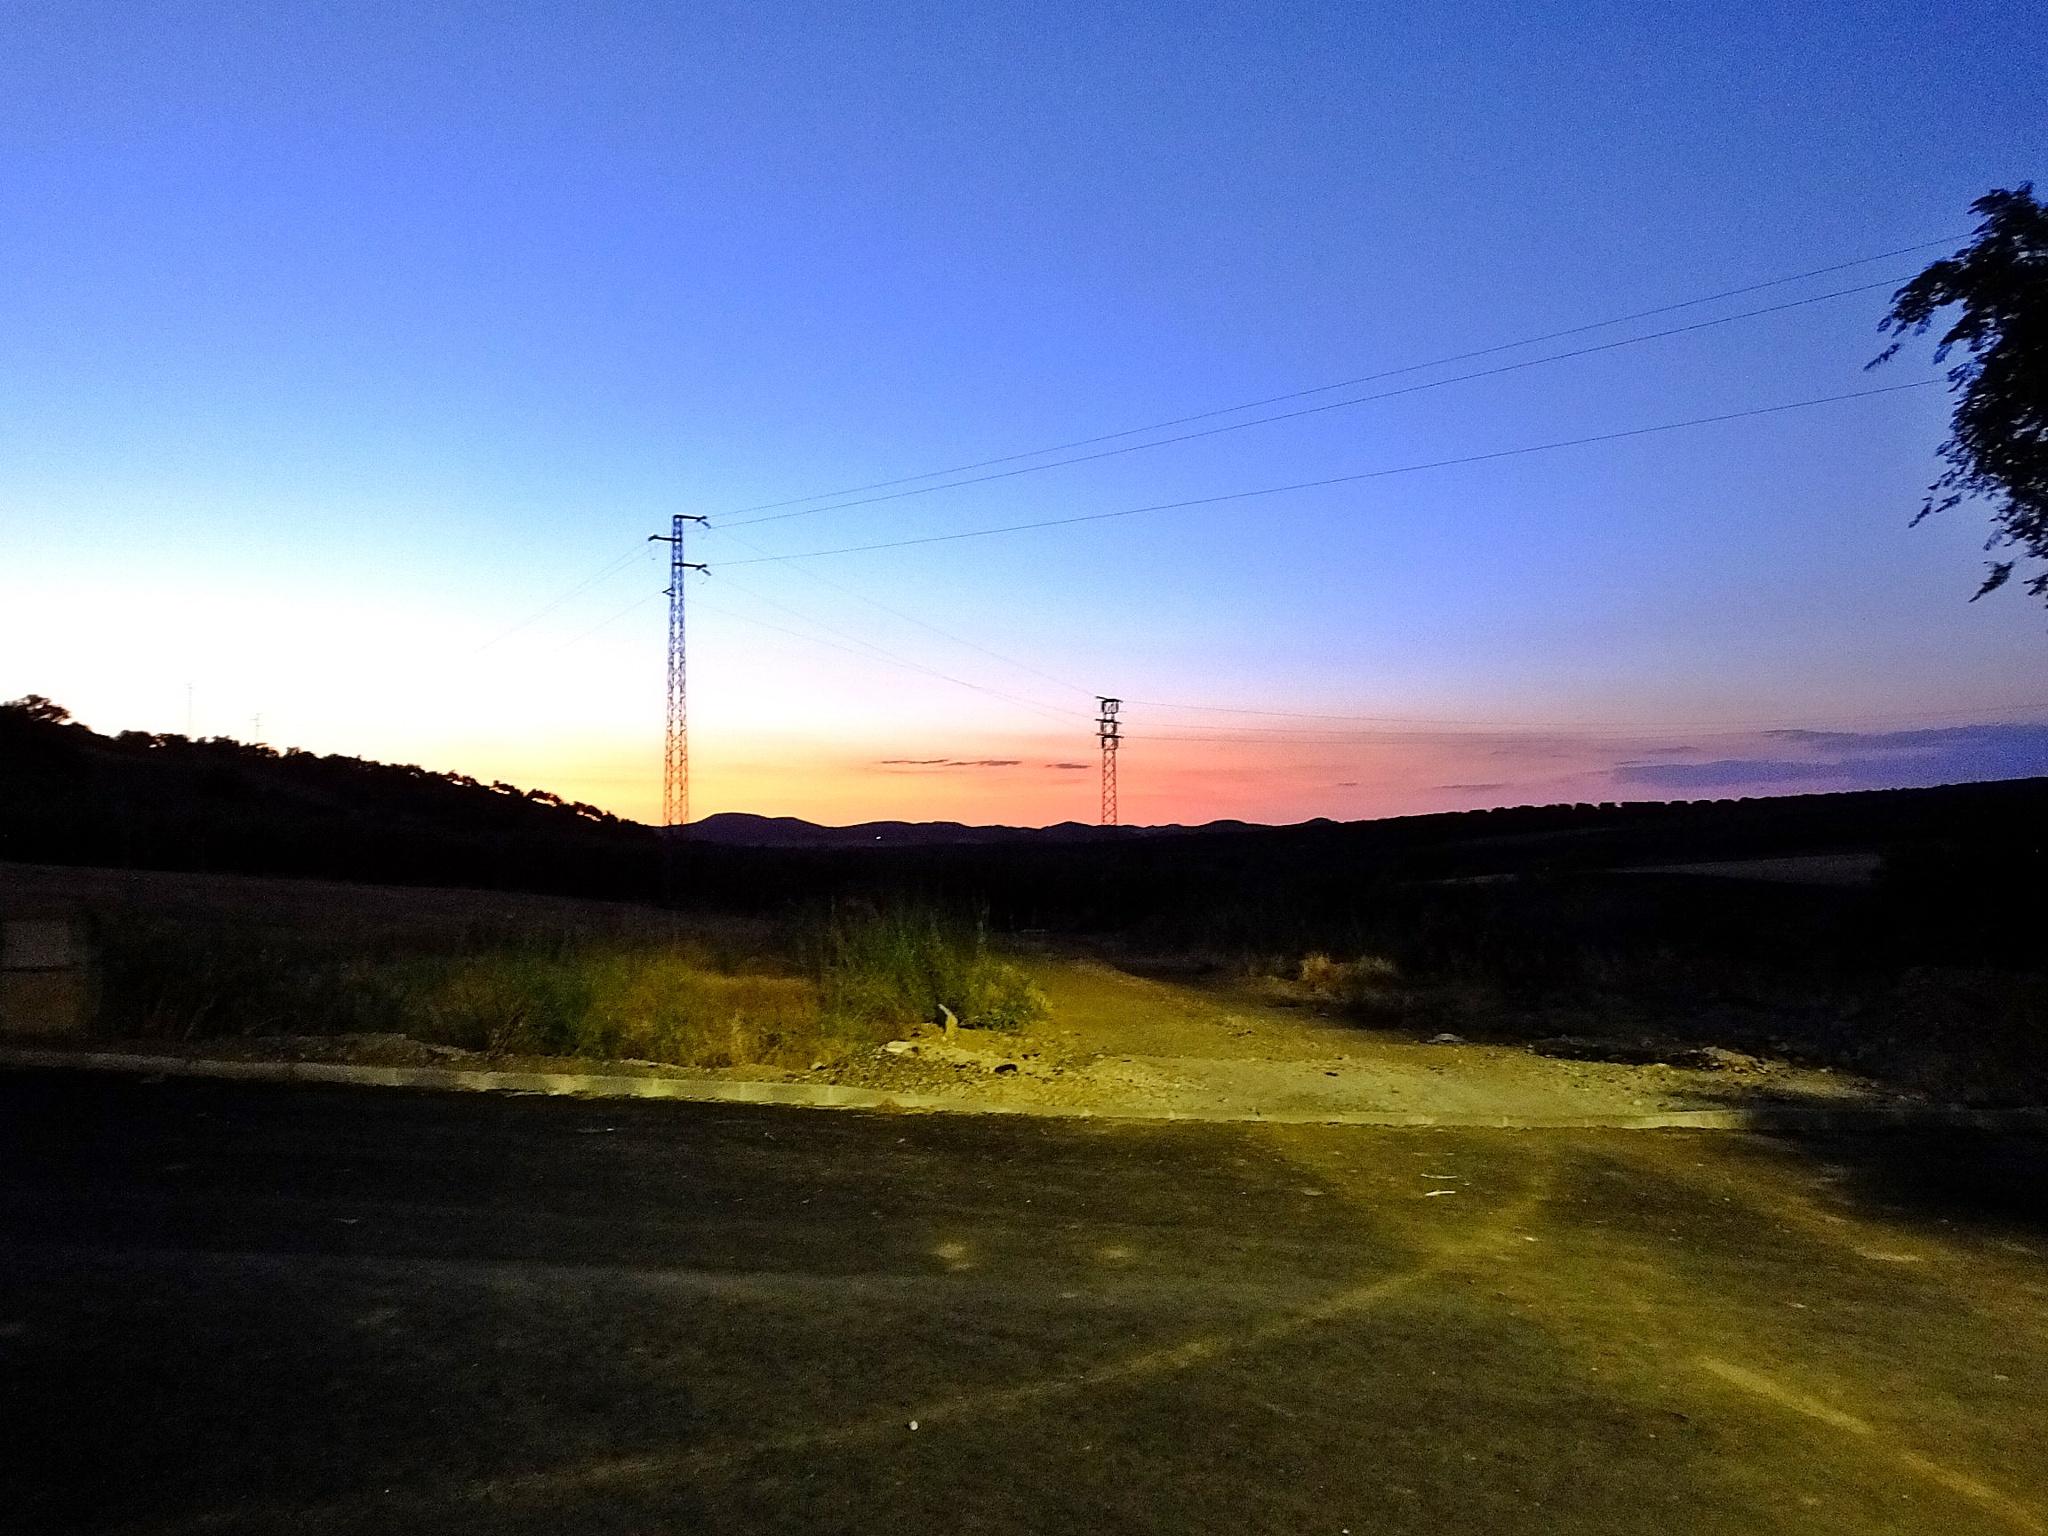 Evening horizon by Peter Rowland